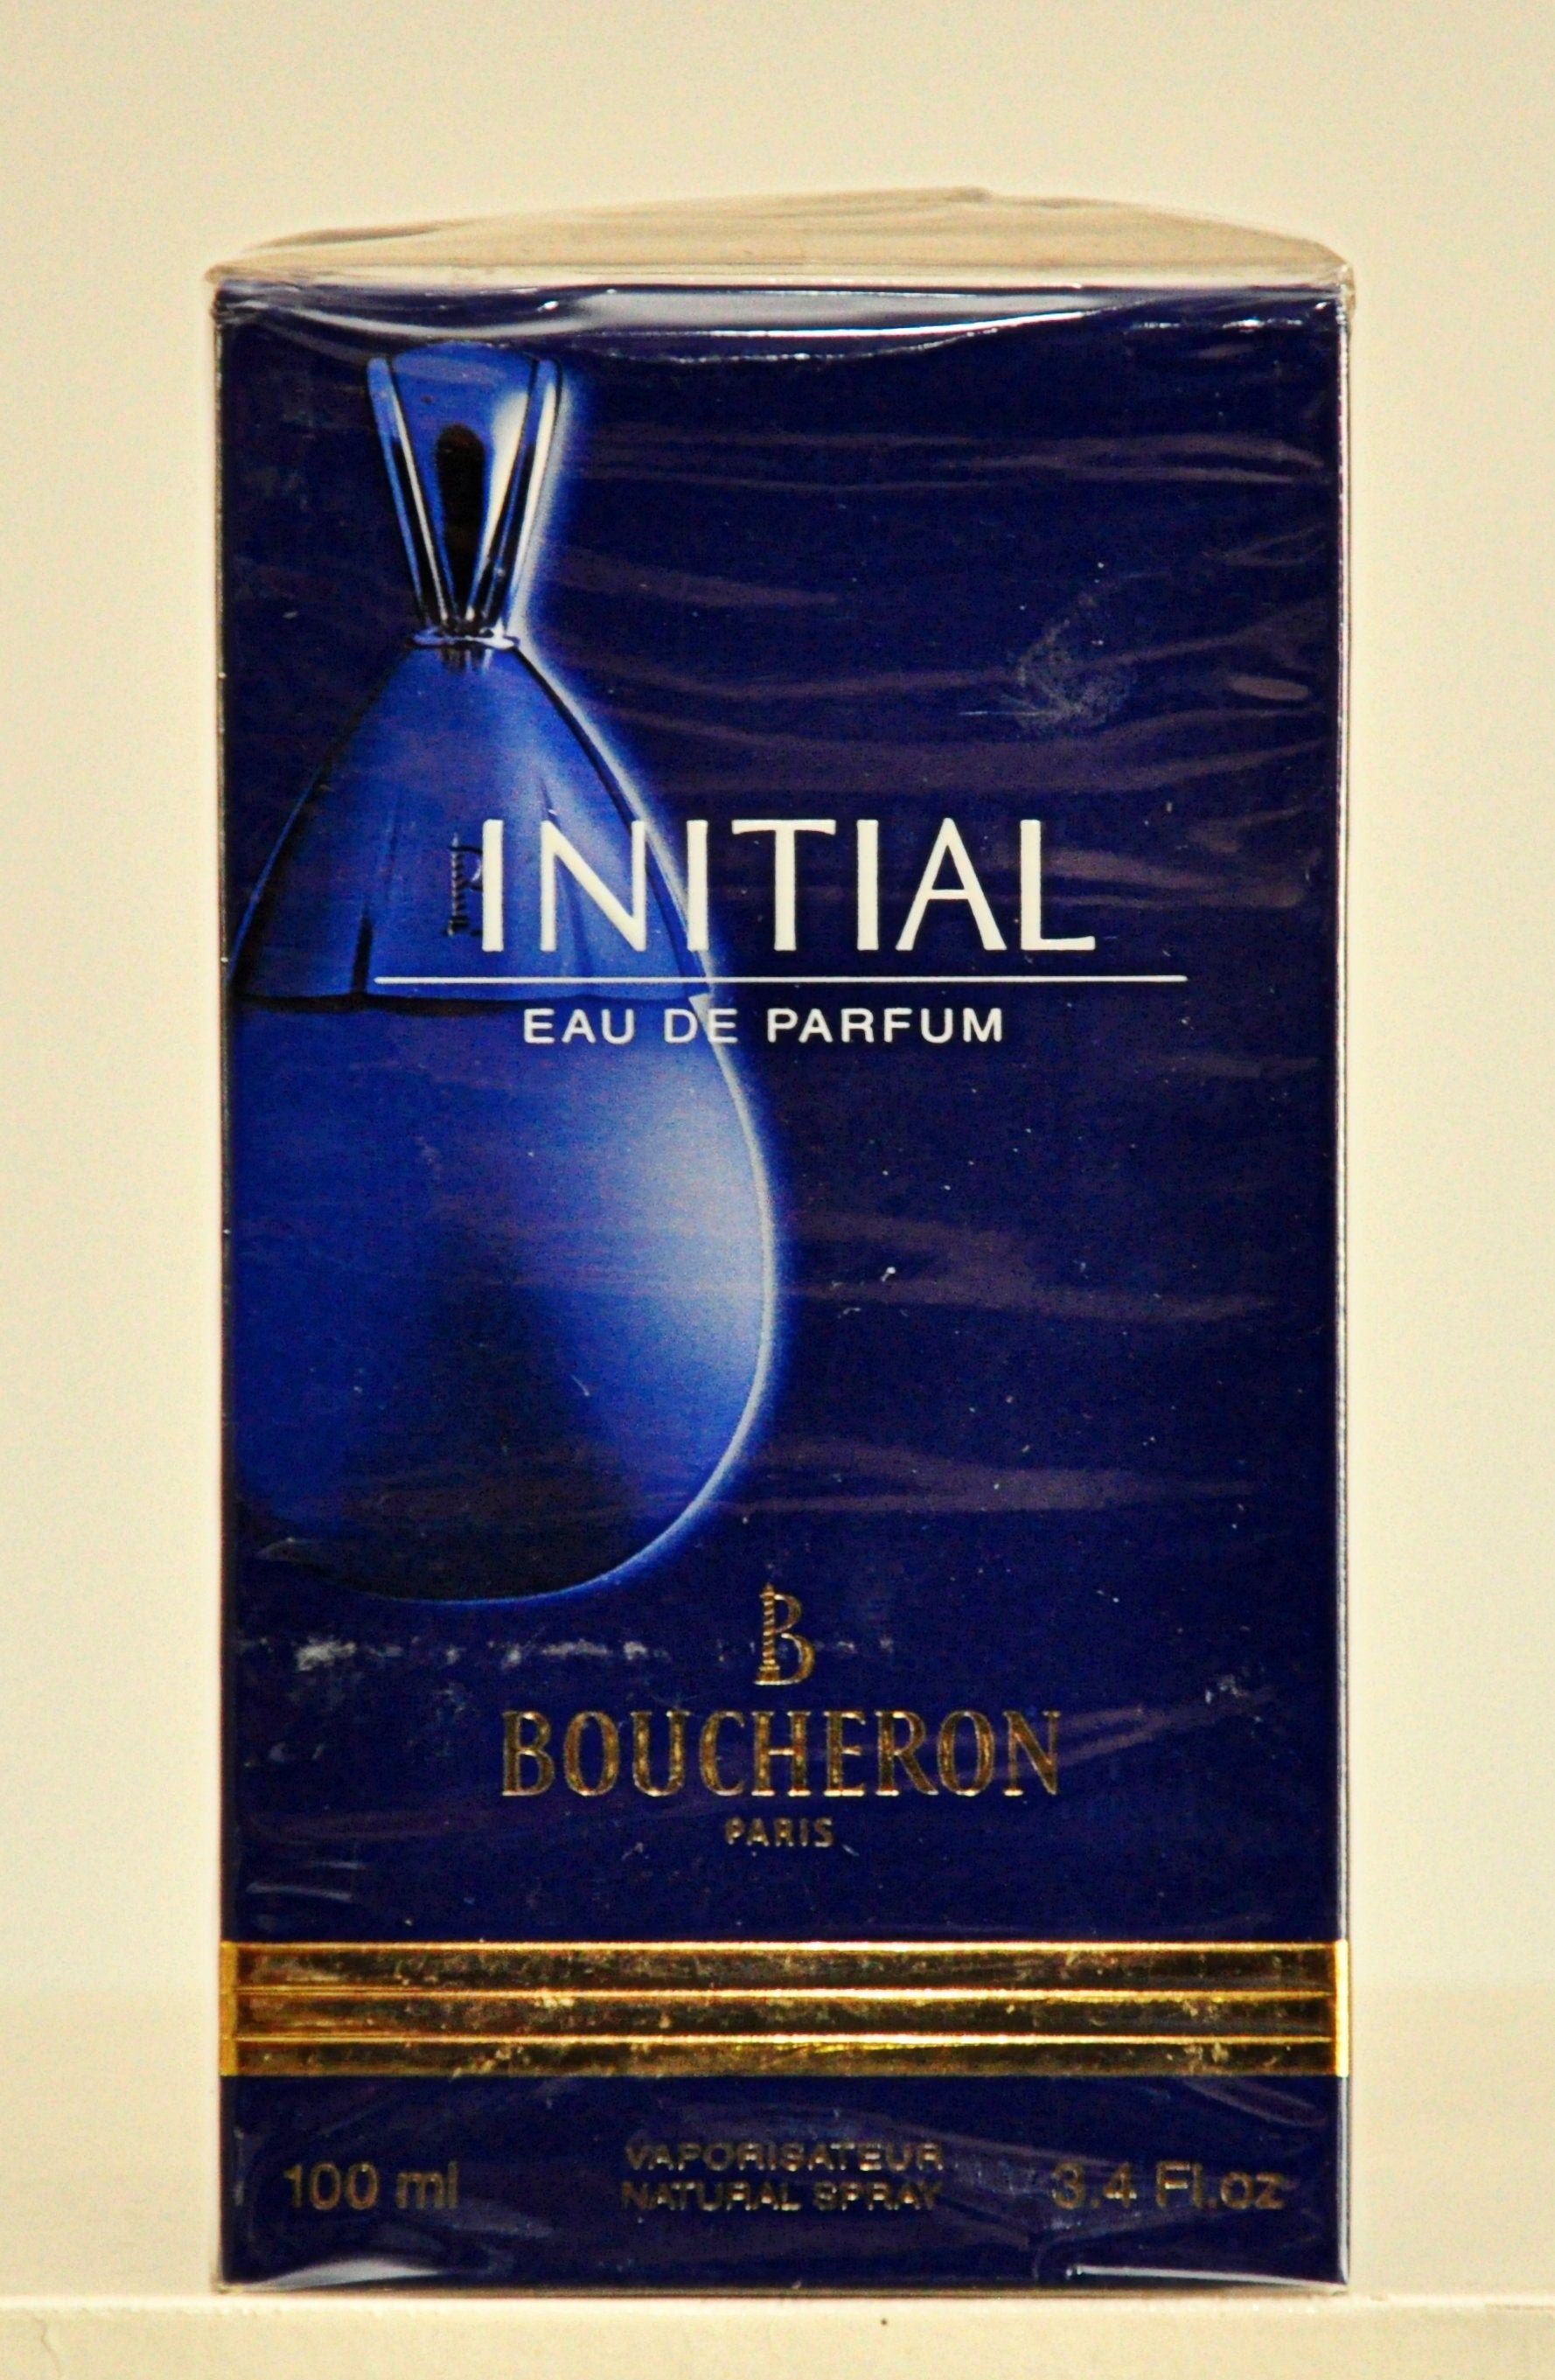 Boucheron Initial Eau De Parfum Edp 100ml 3 4 Fl Oz Spray Etsy Eau De Parfum Perfume Spray Perfume